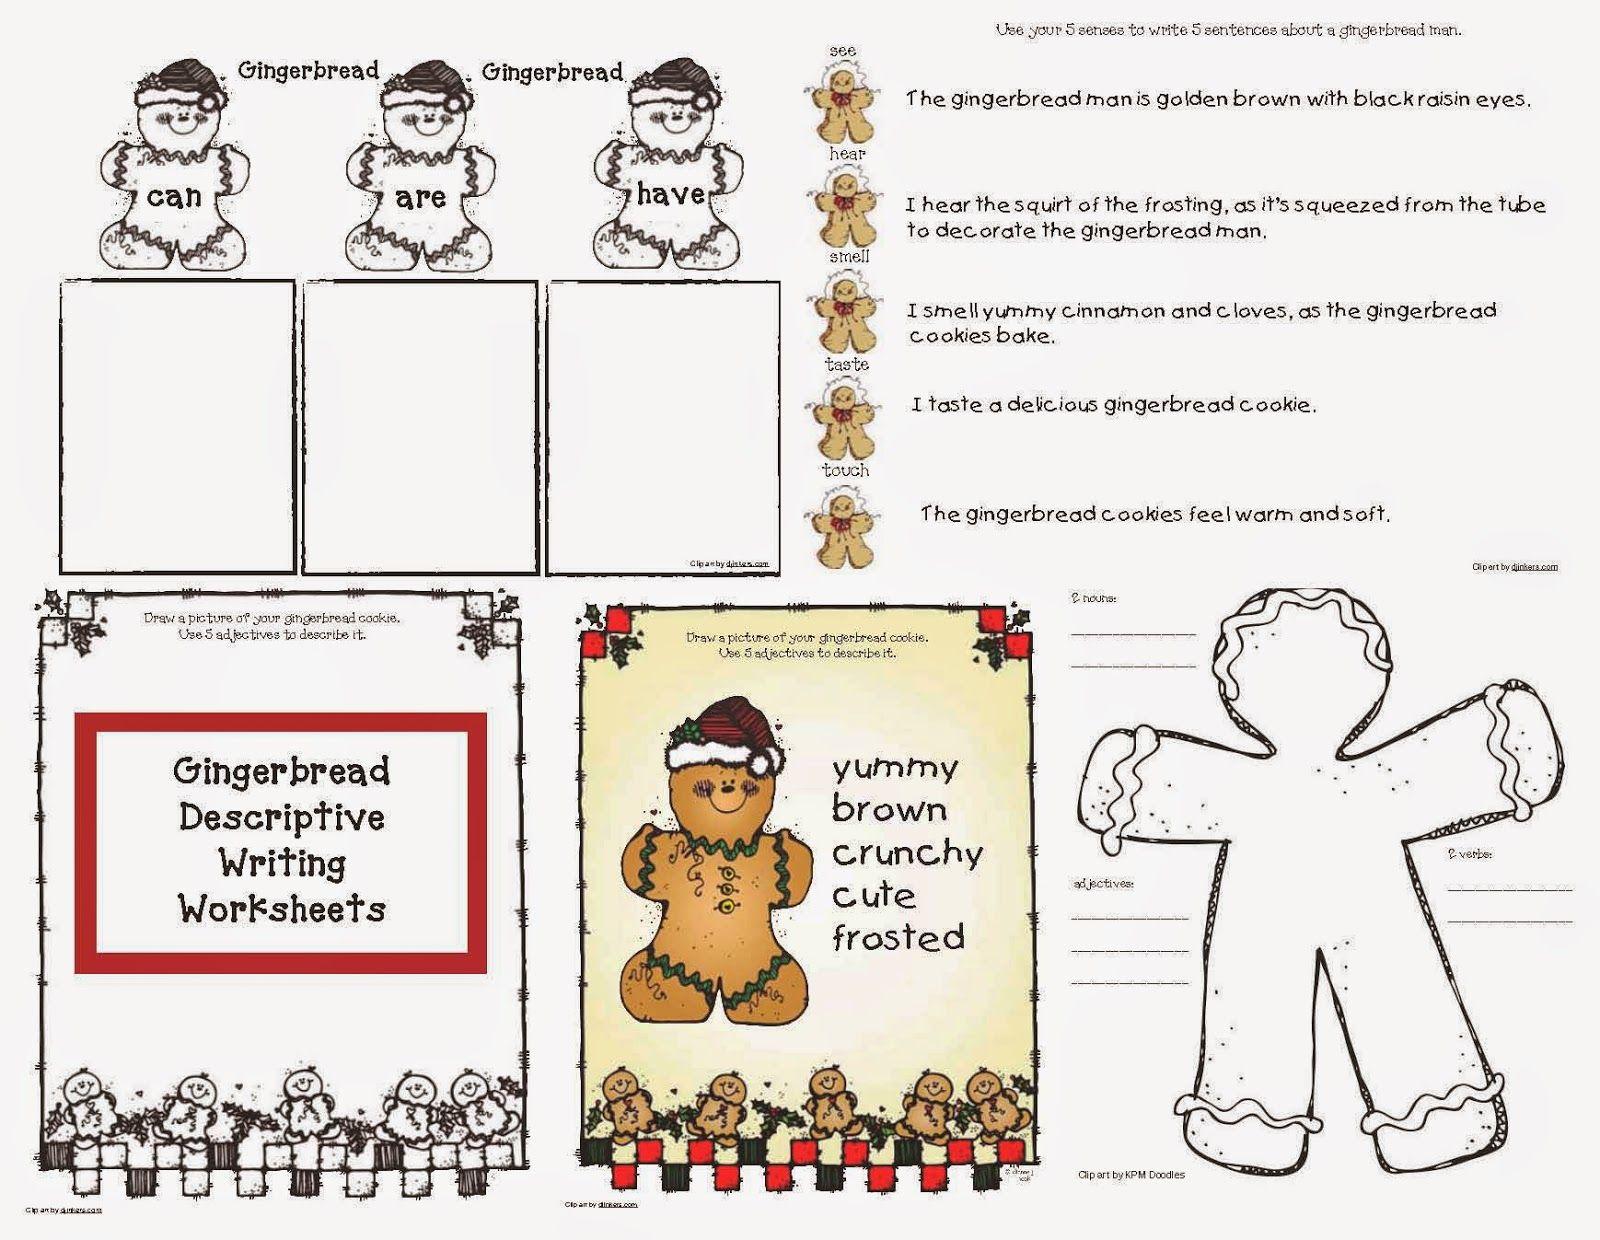 Gingerbread Descriptive Writing Worksheets